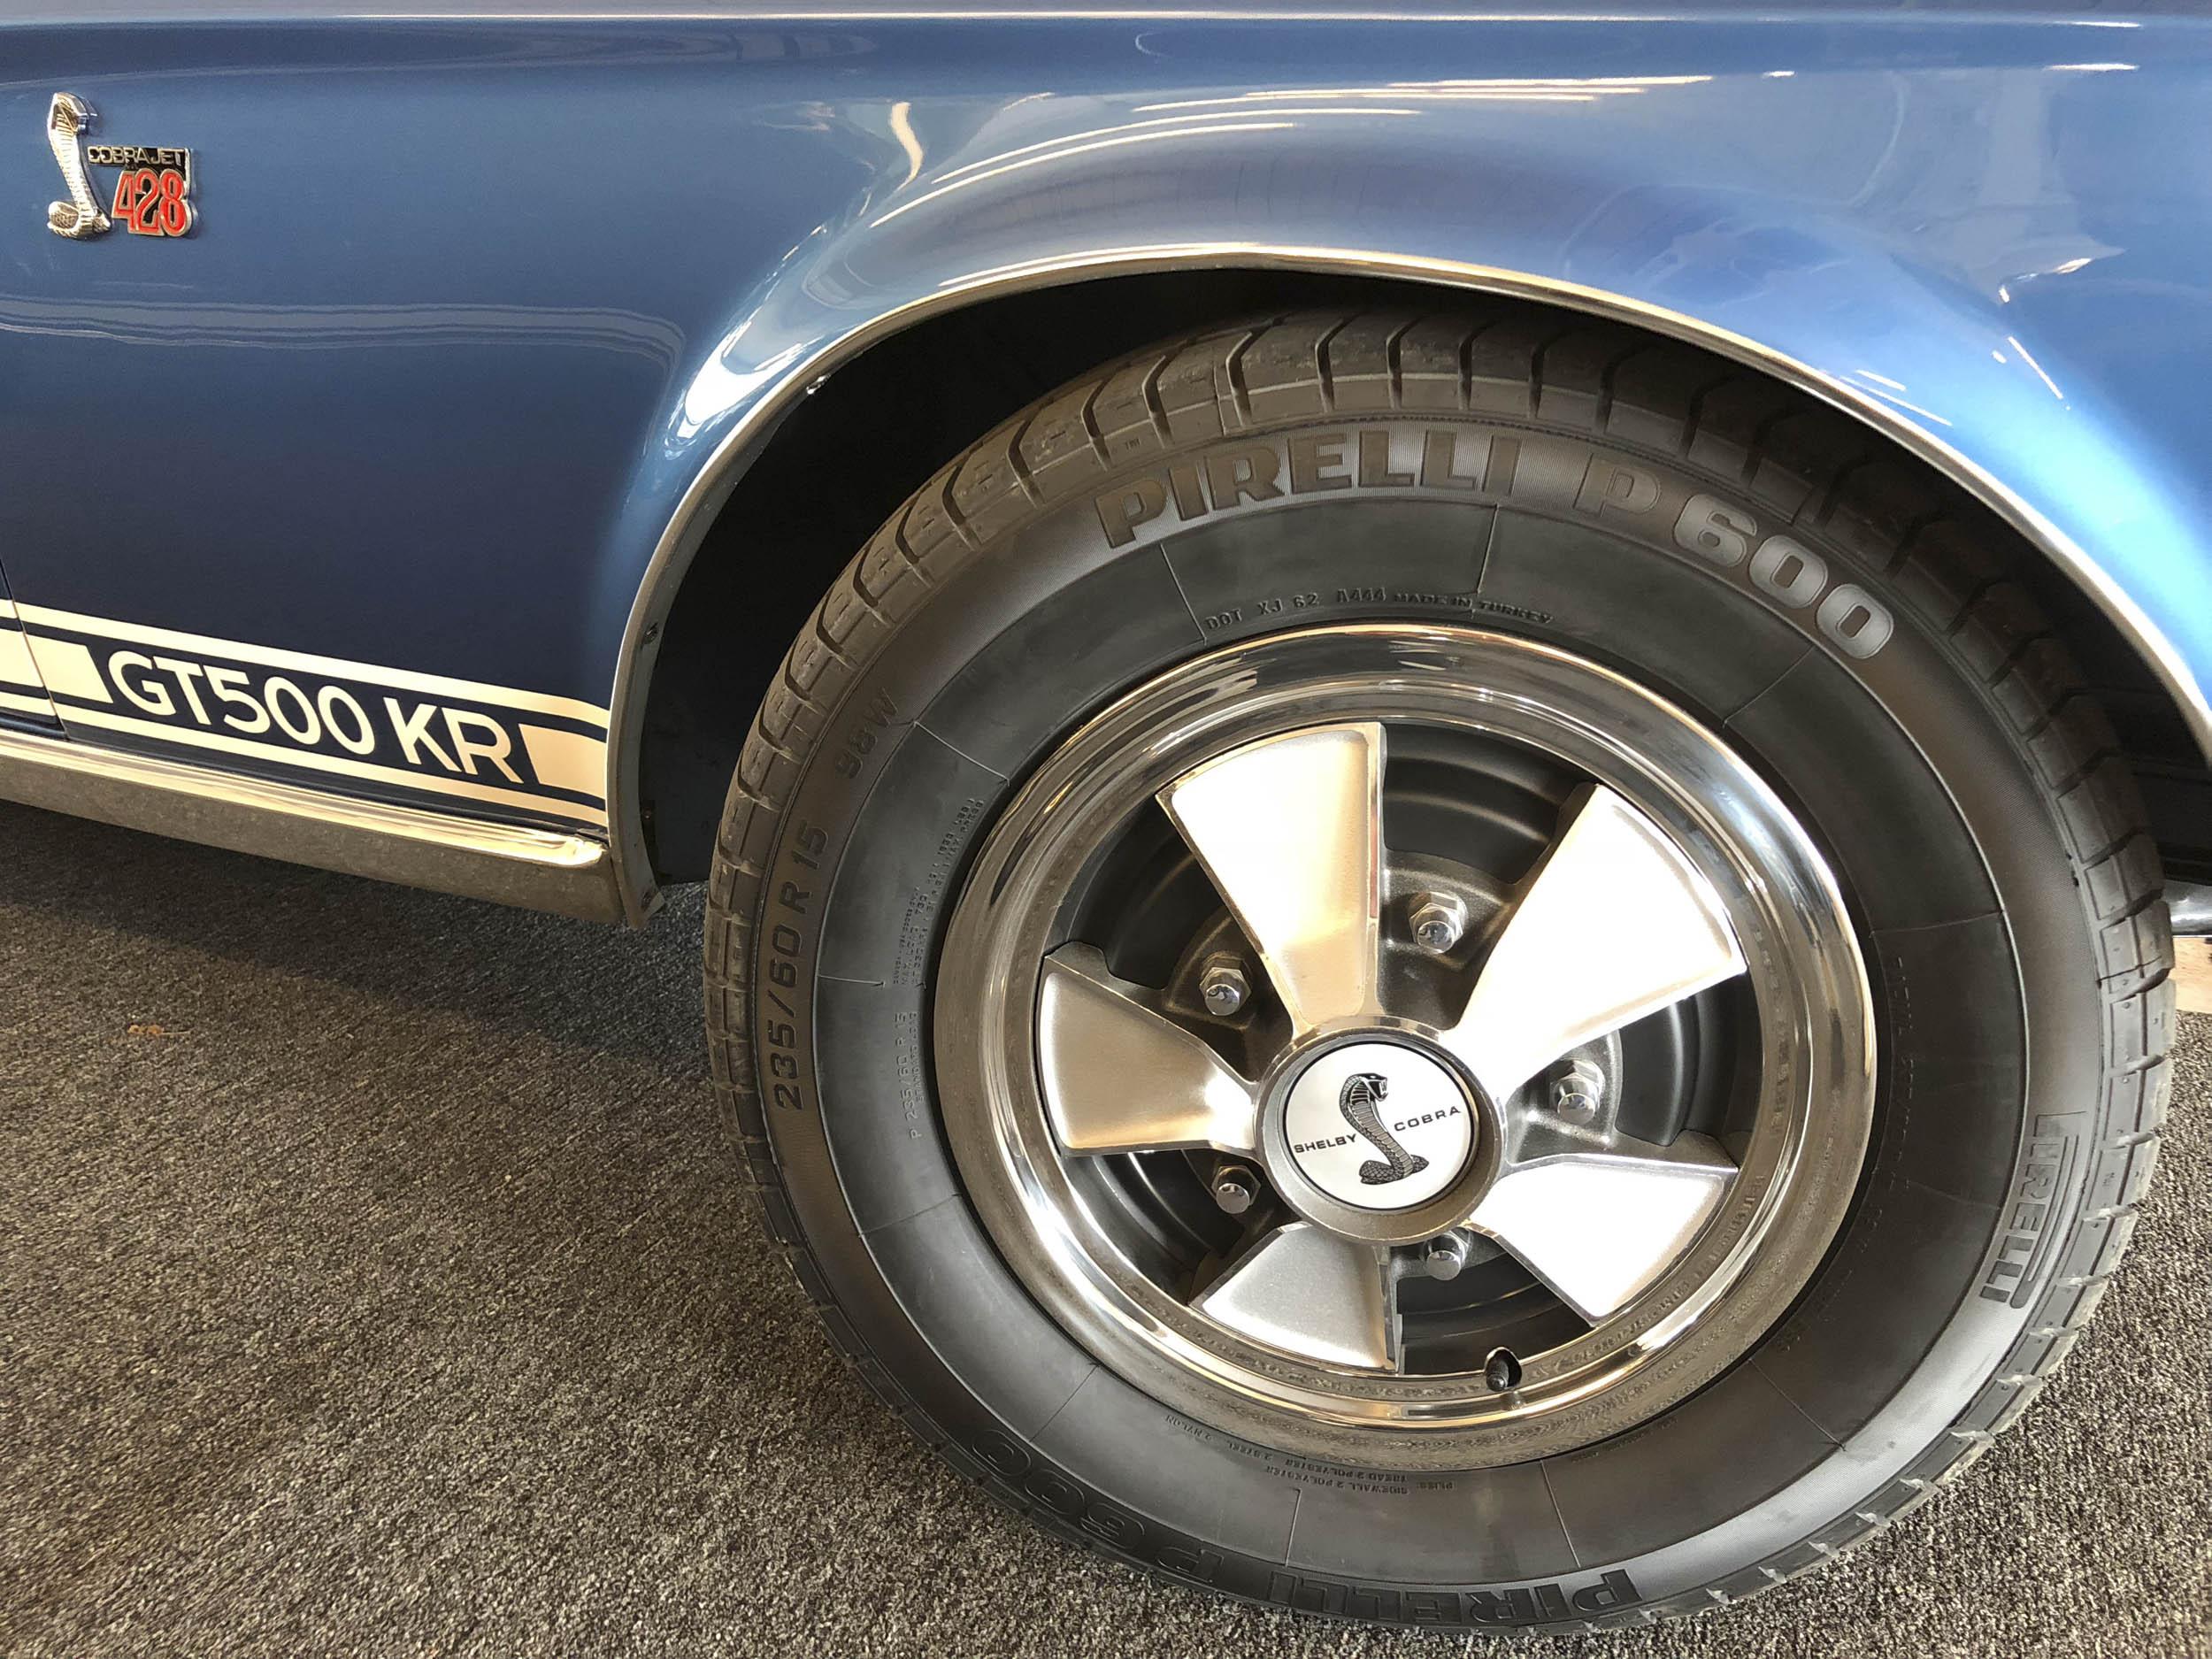 Modern rubber tires on a GT500 KR